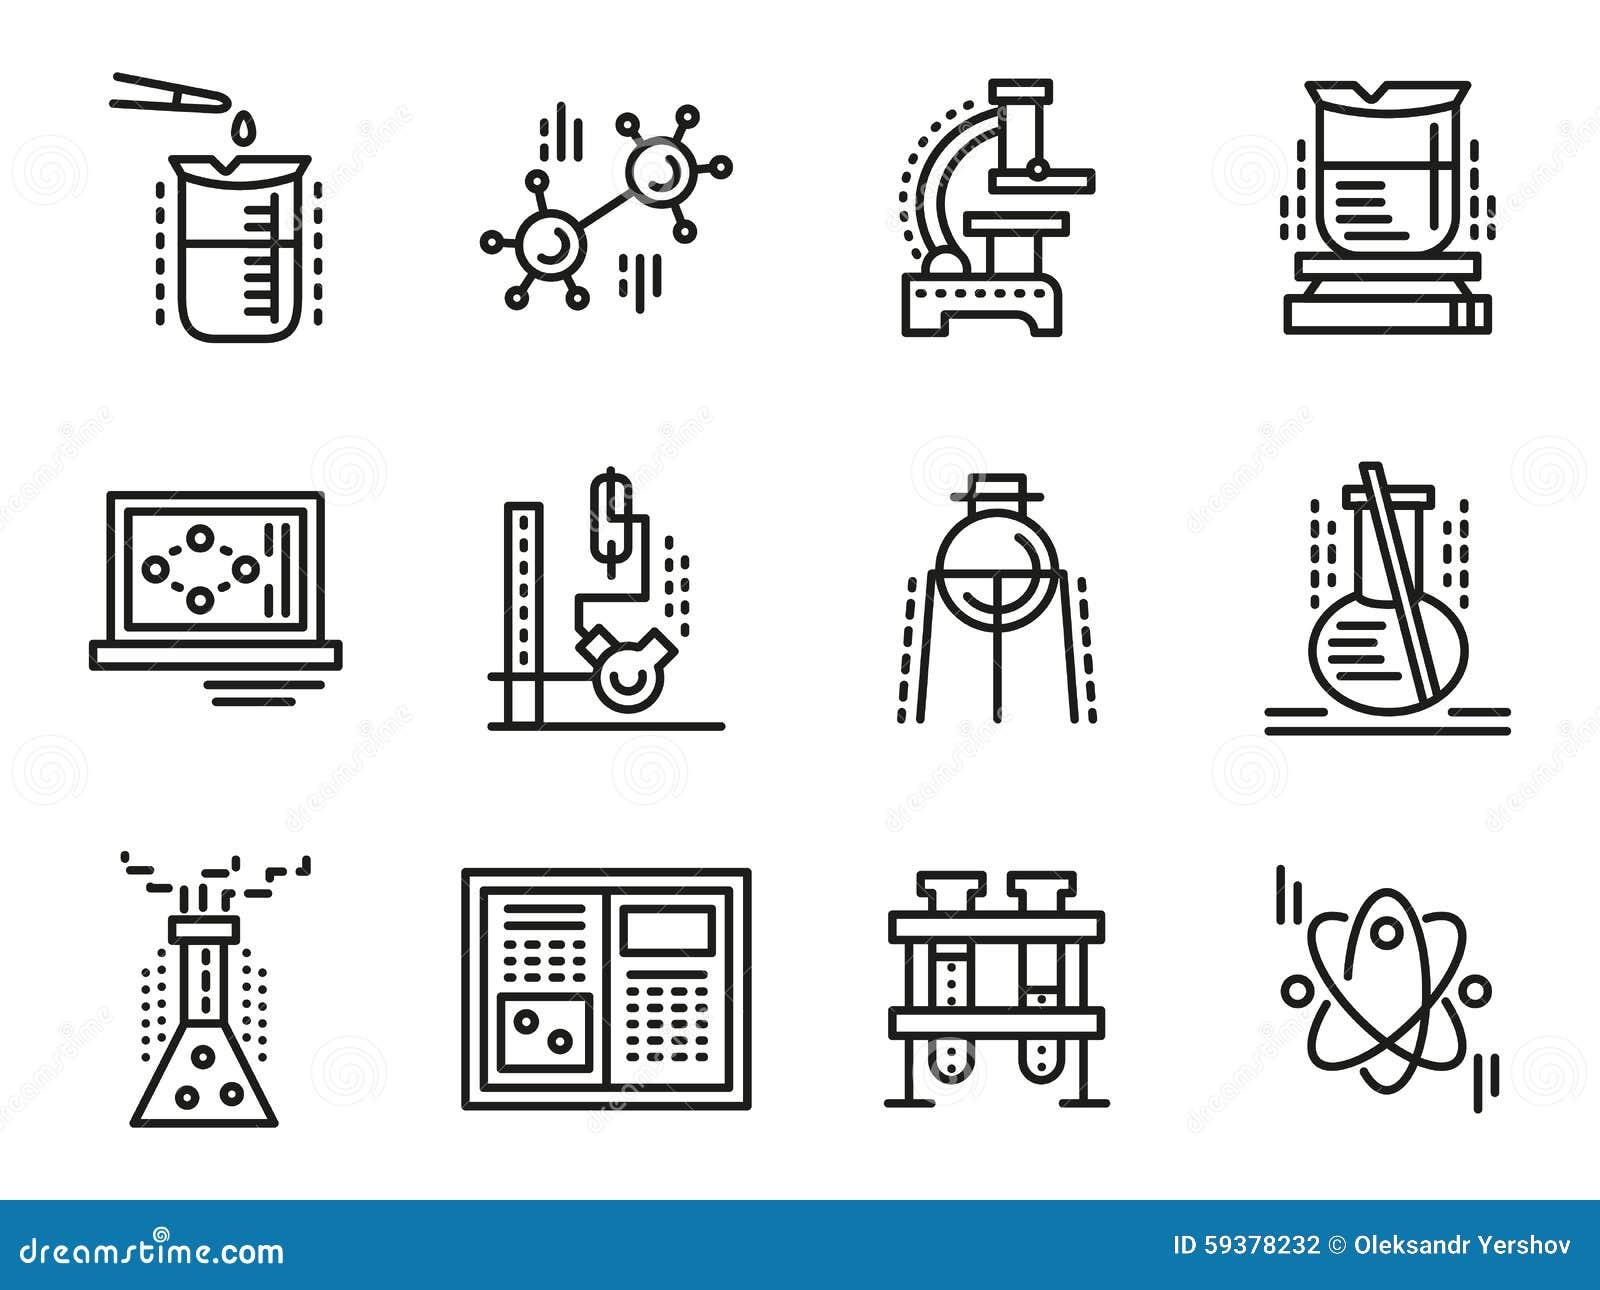 Lab equipment symbols image collections symbol and sign ideas lab equipment symbols gallery symbol and sign ideas chemistry symbols simple line icons set stock illustration buycottarizona